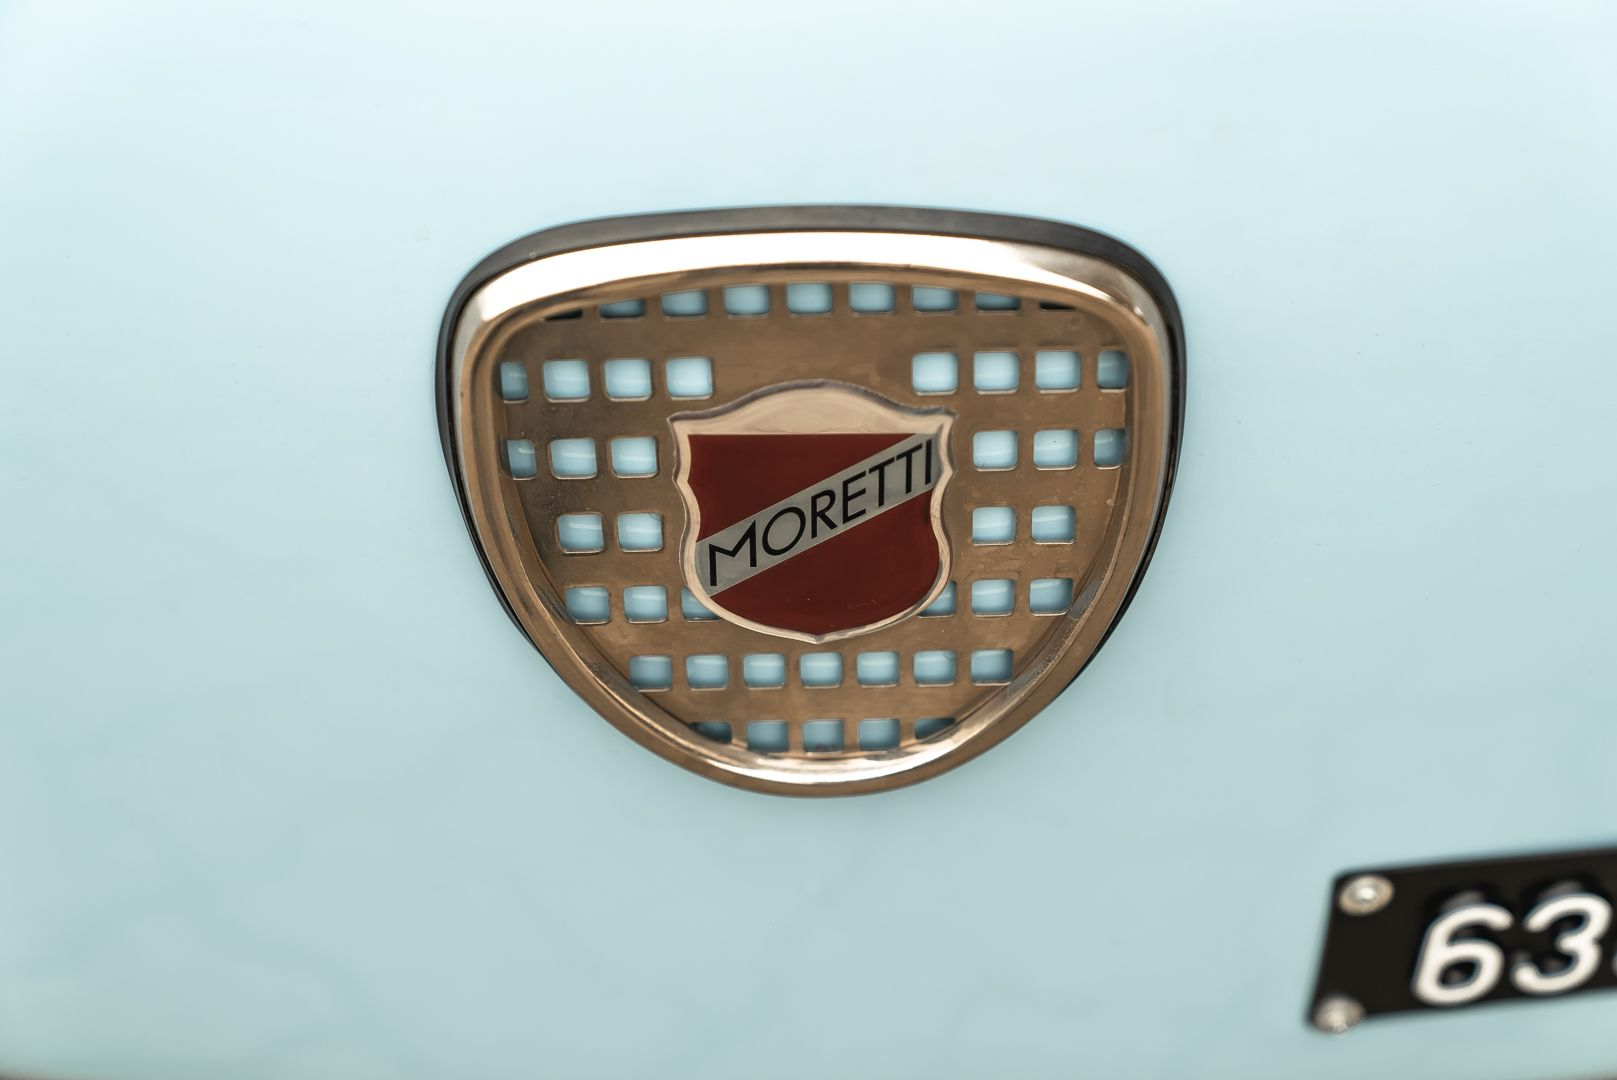 1971 Fiat 500 F Replica Speedster 80059